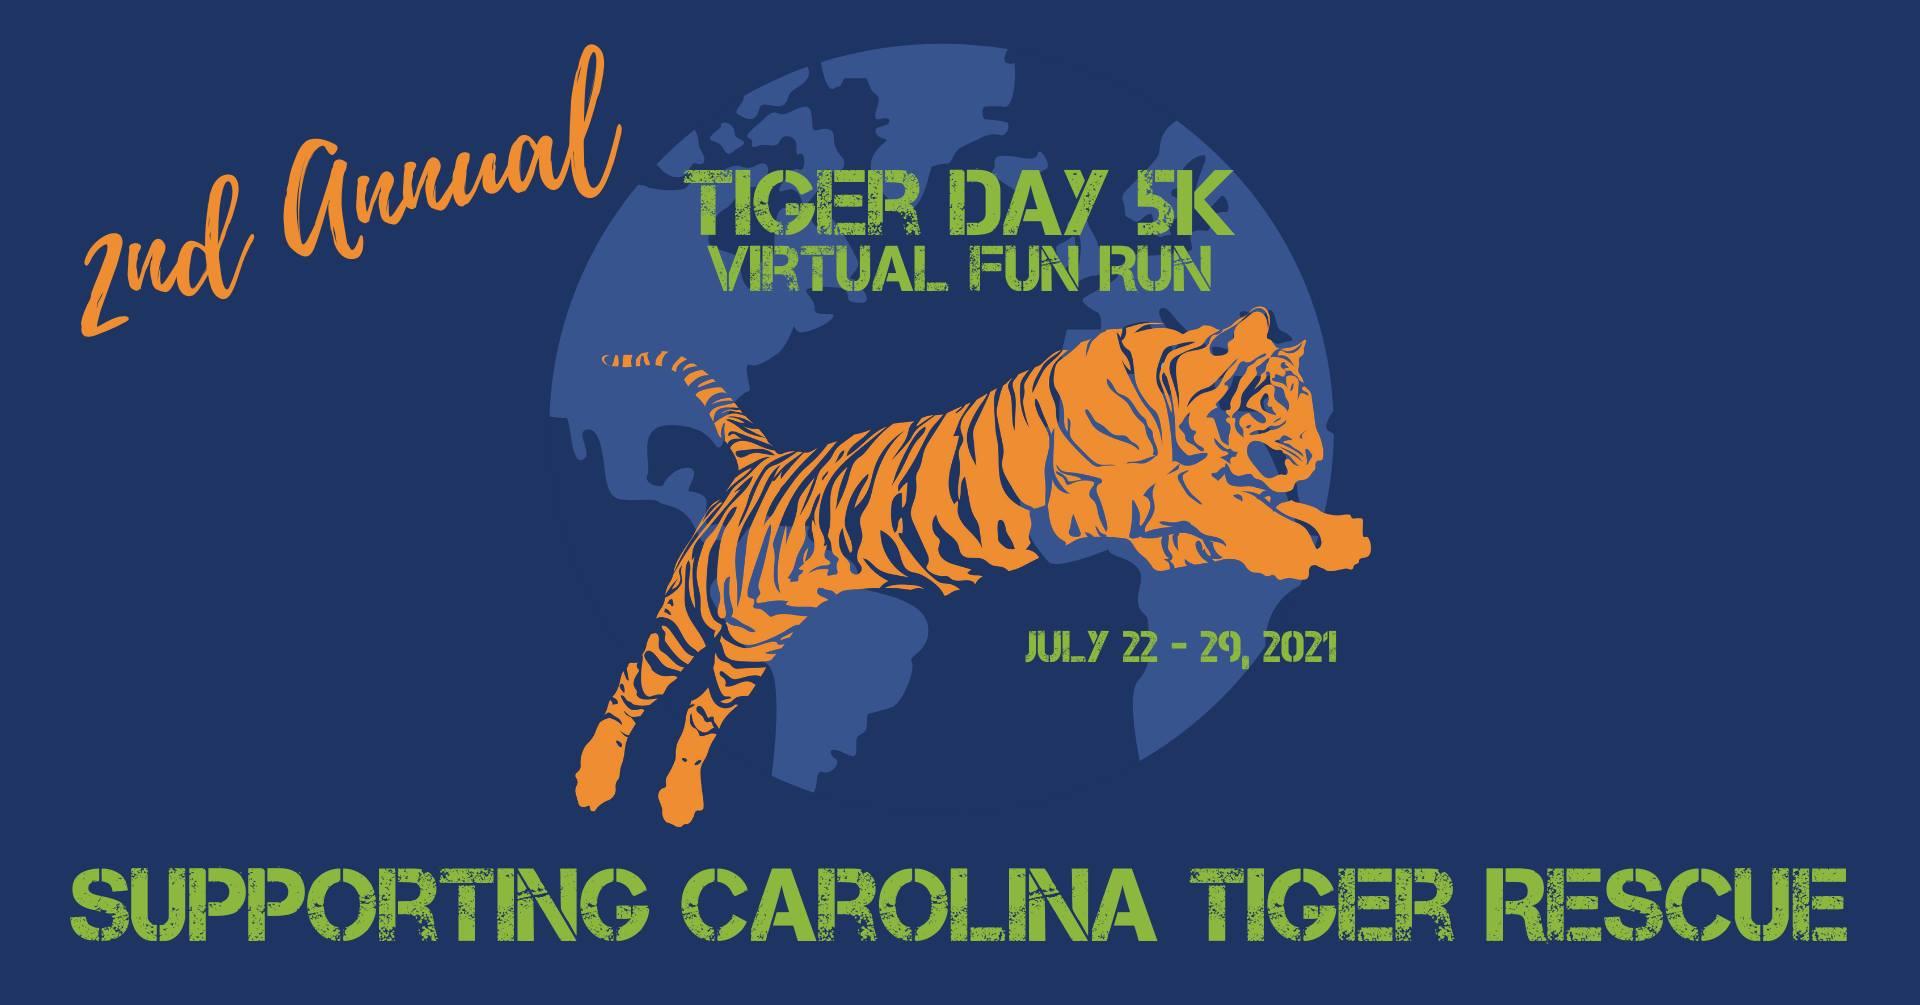 Tiger Day Fun Run tshirt for 2021